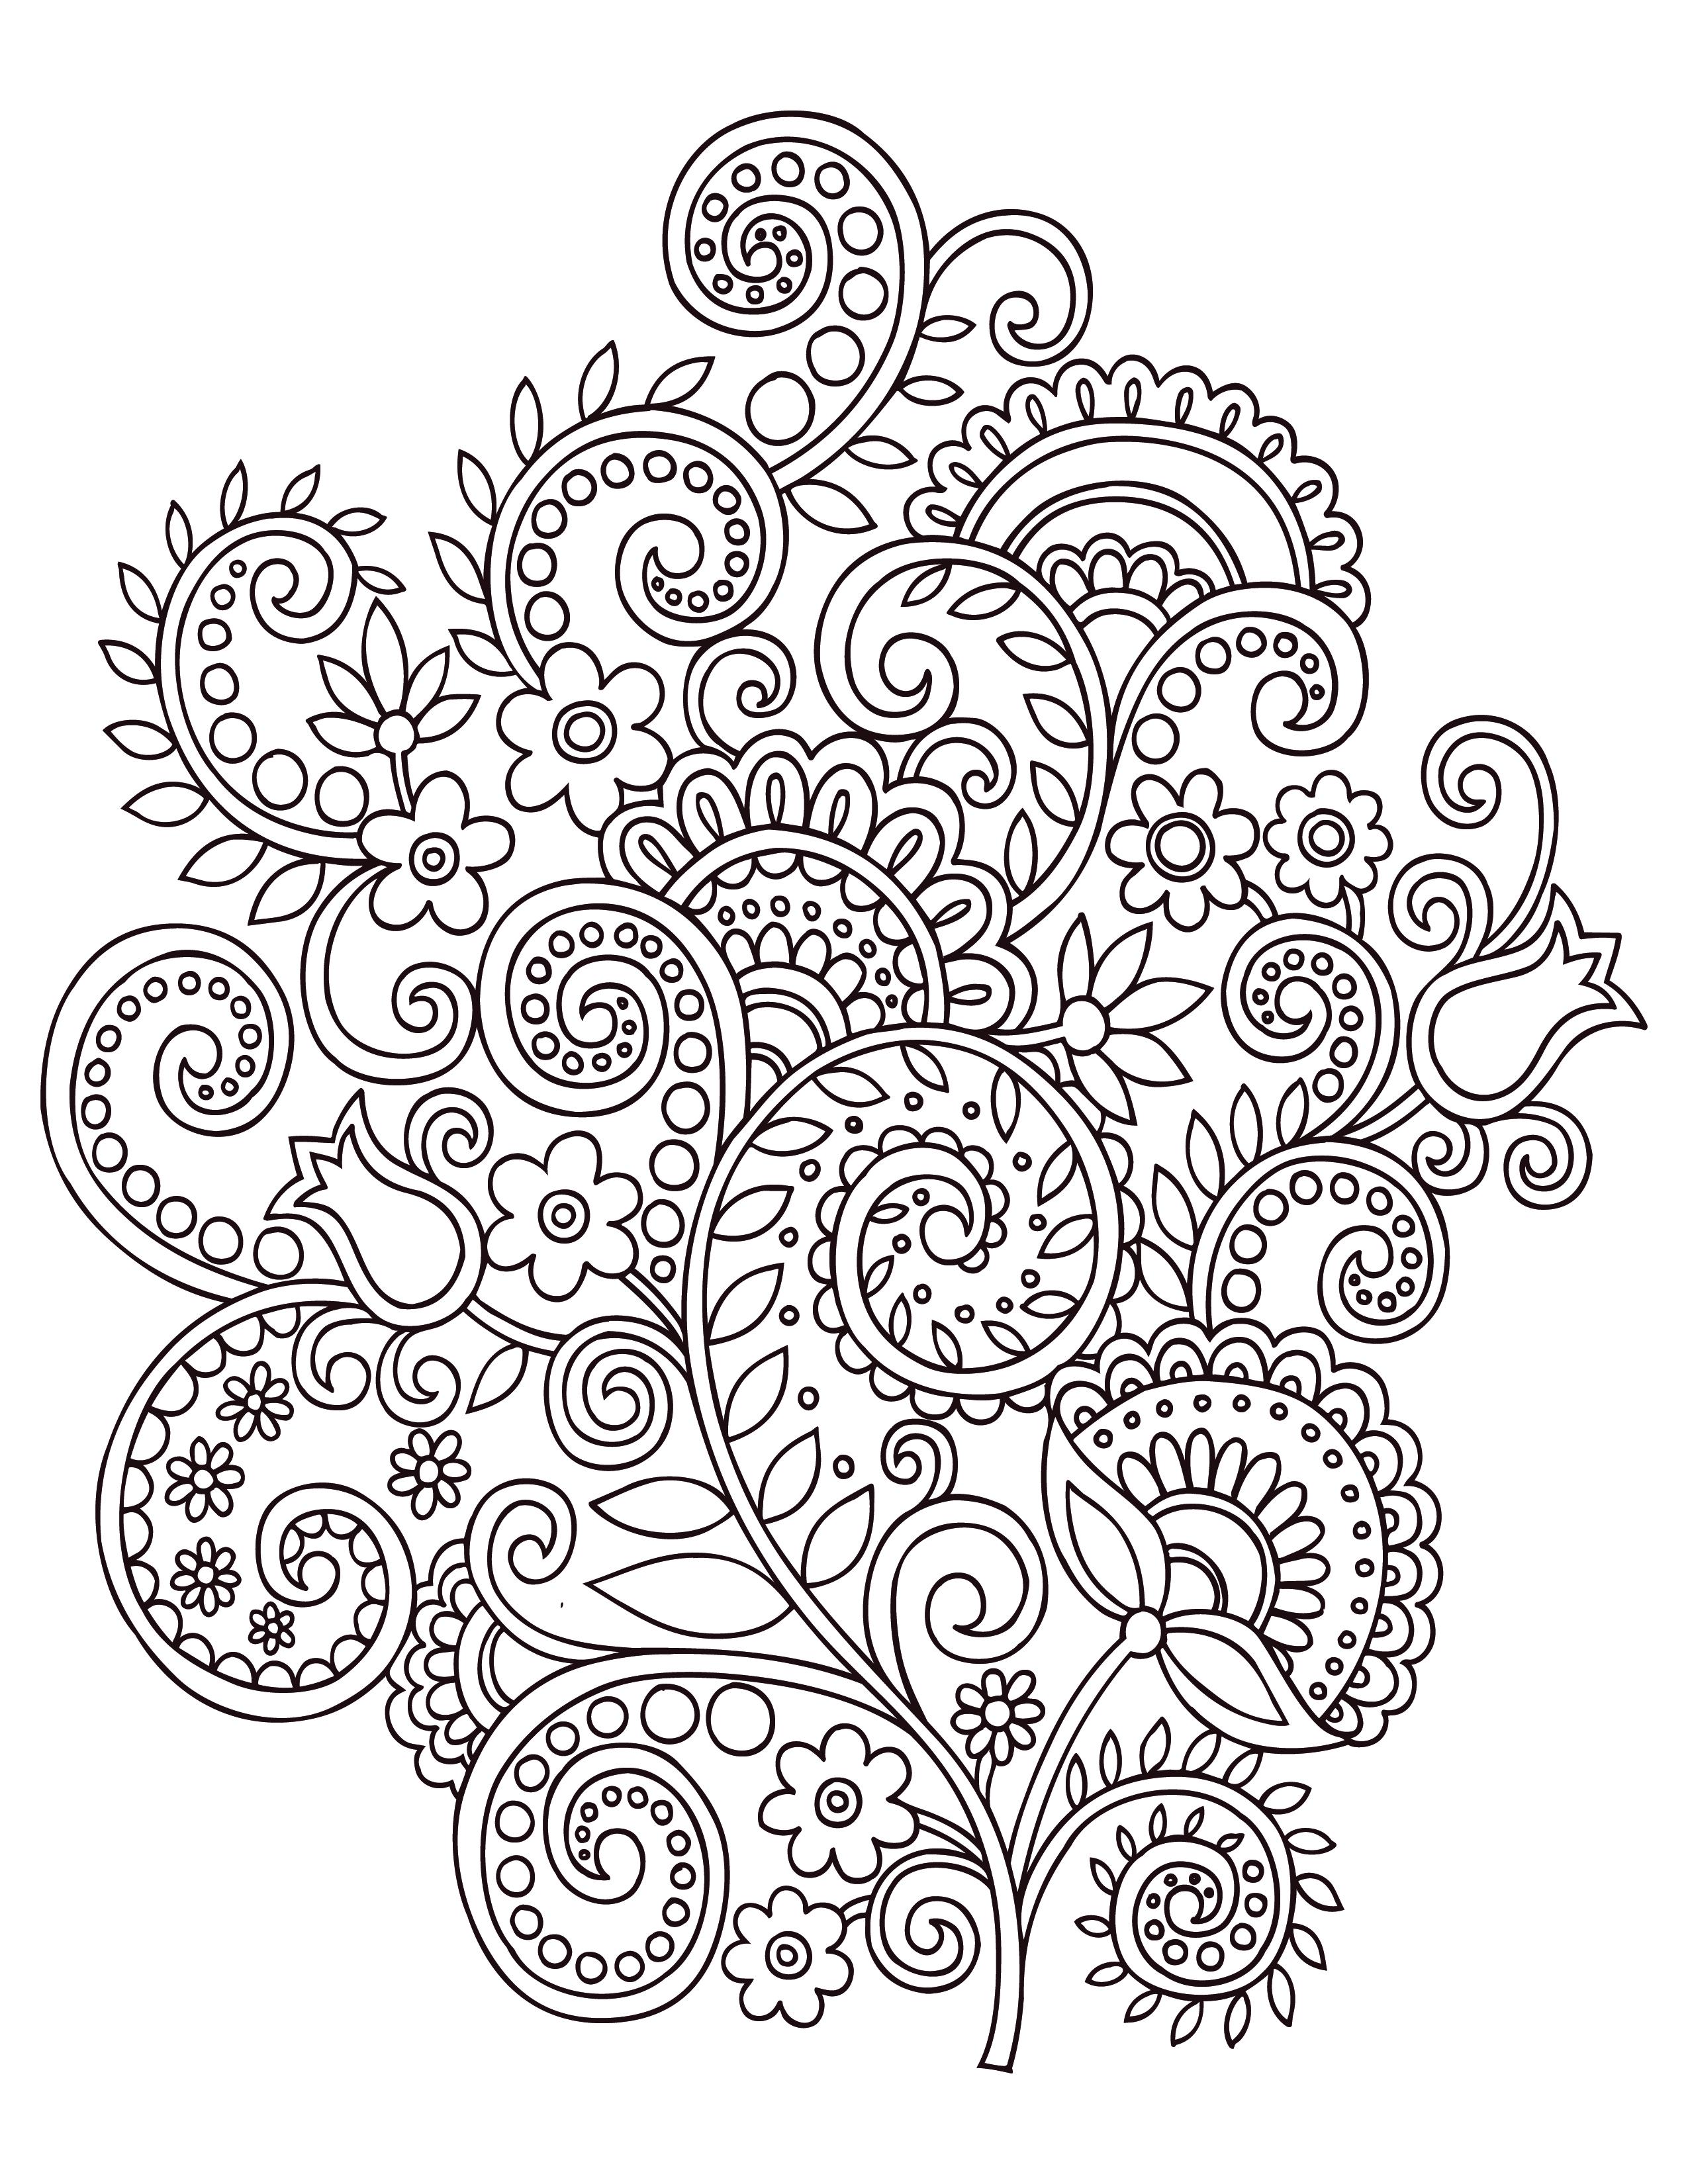 Fleurs doodle coloriage anti stress gratuit - Dessin anti stresse ...